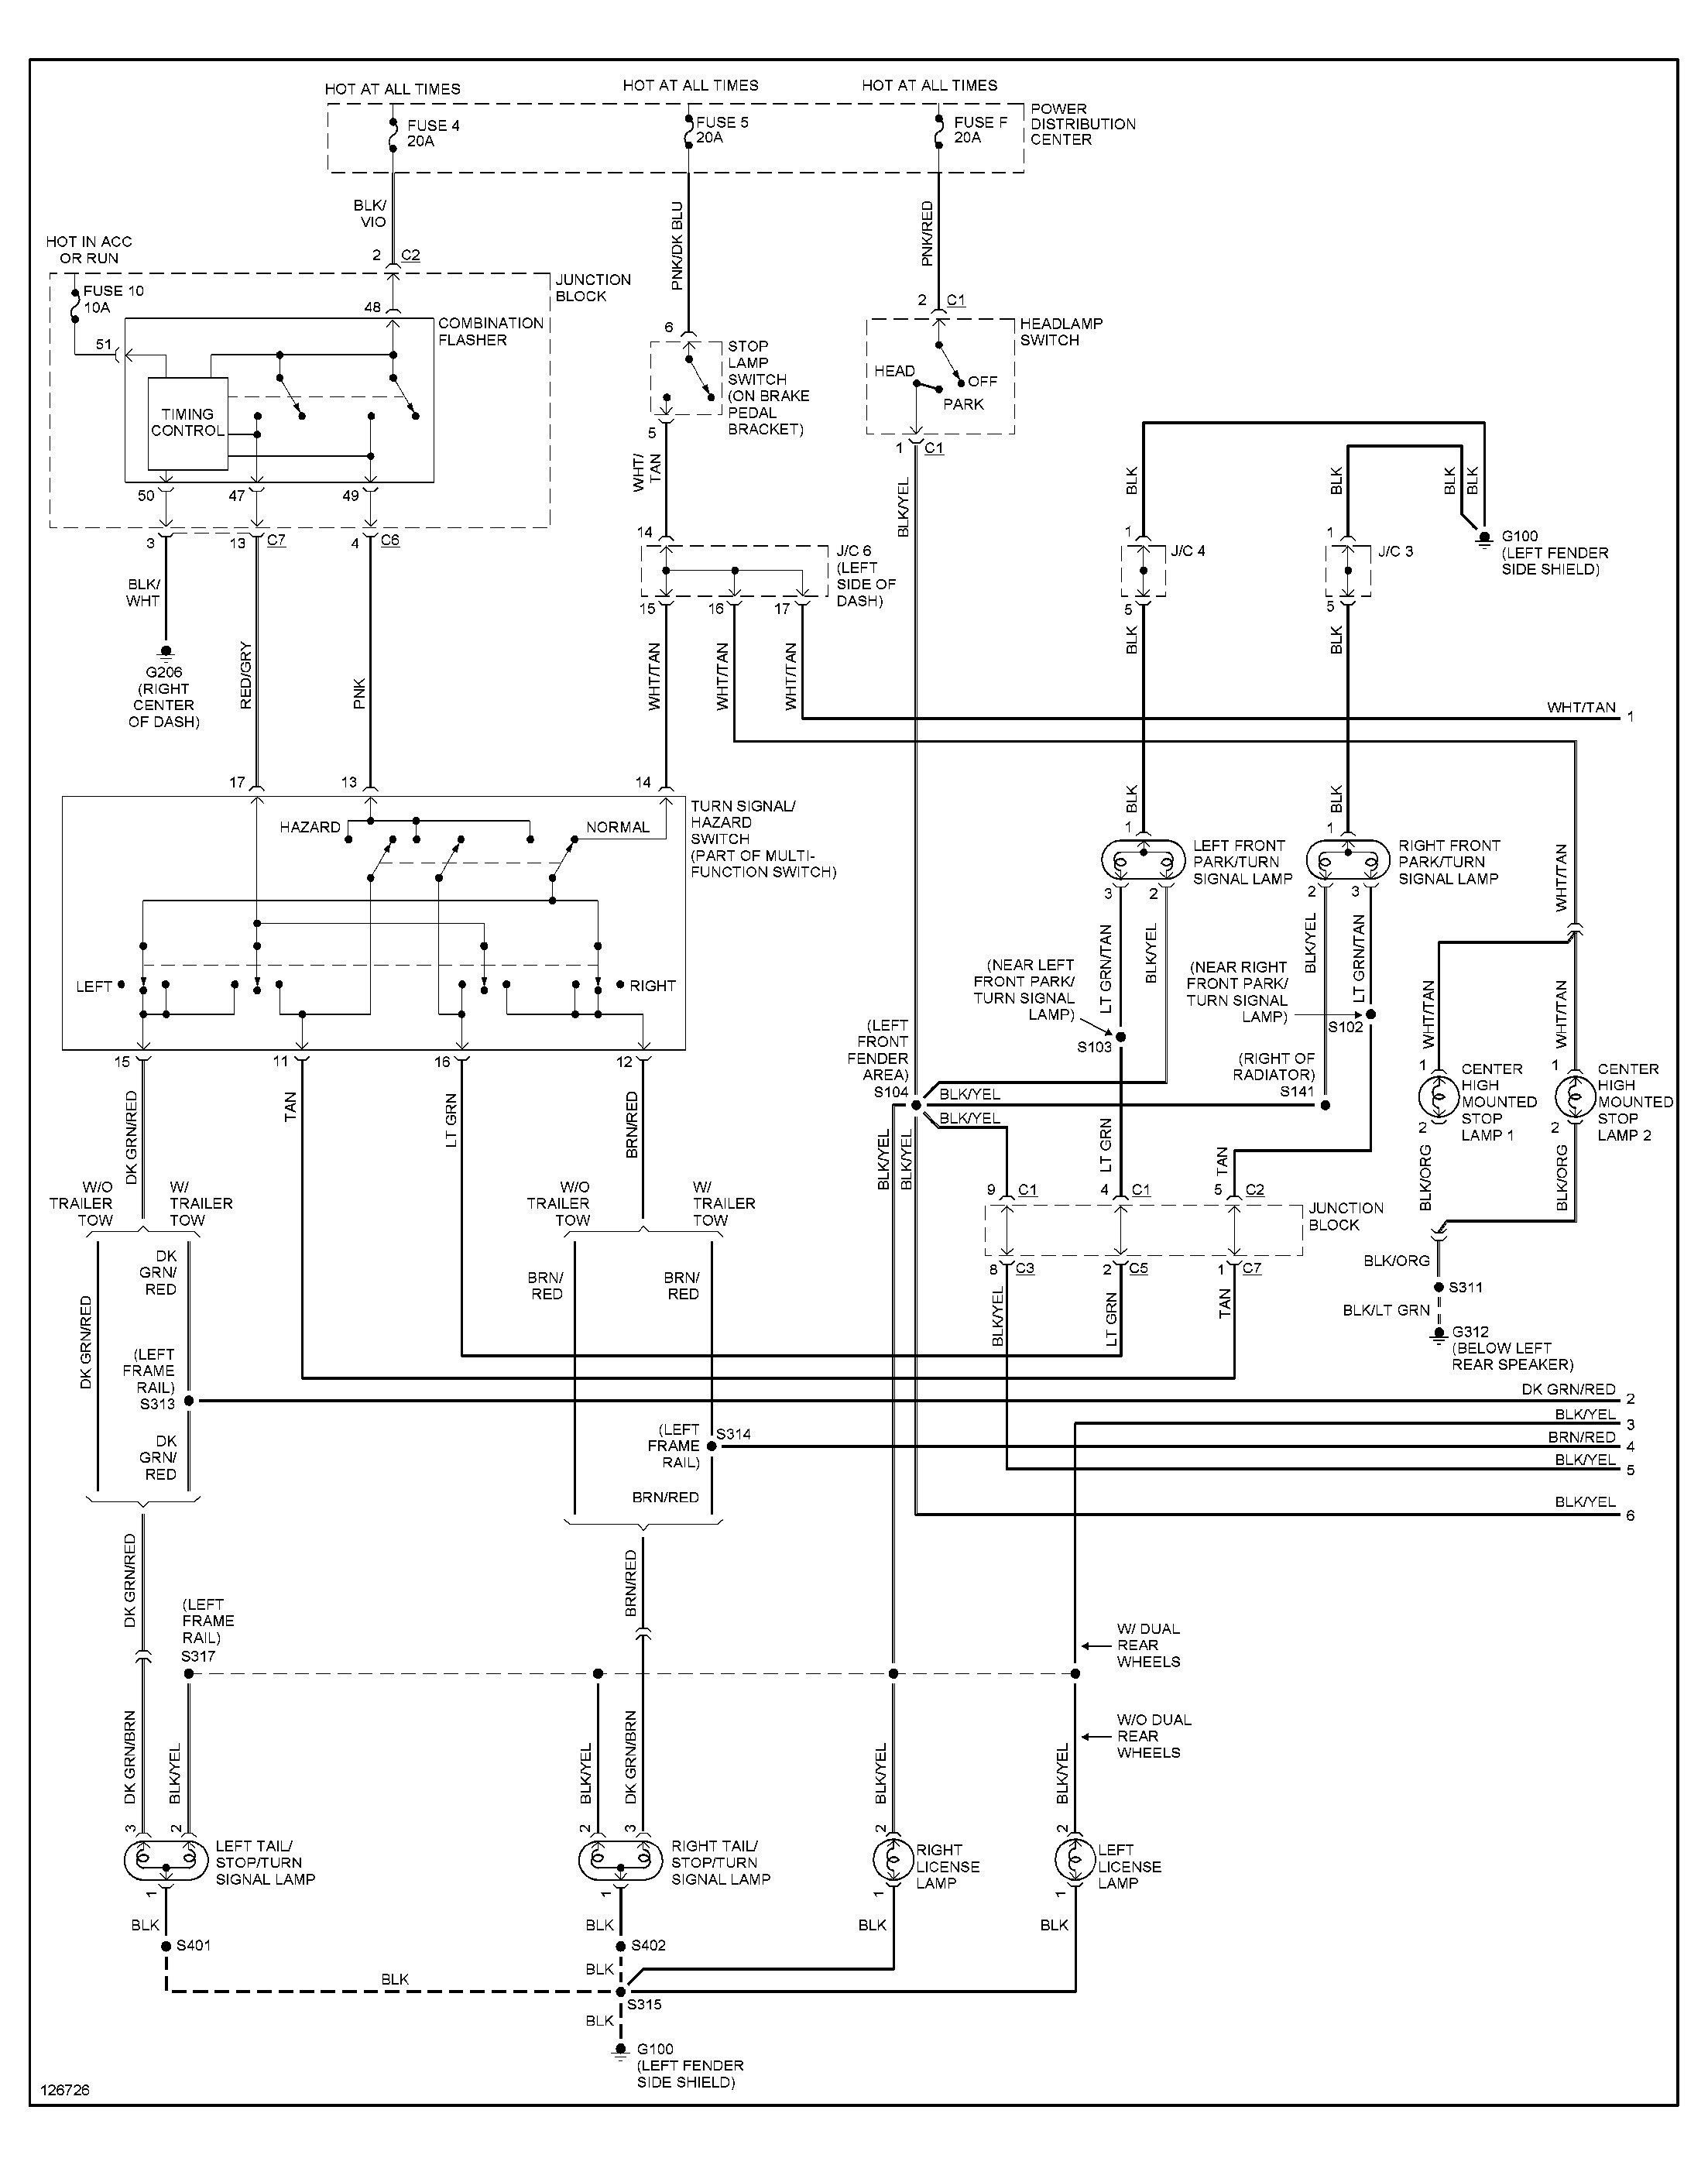 Diagram Audi A4 Quattro Front Headlight Wiring Diagram Full Version Hd Quality Wiring Diagram Rendiagramk Anticheopinioni It